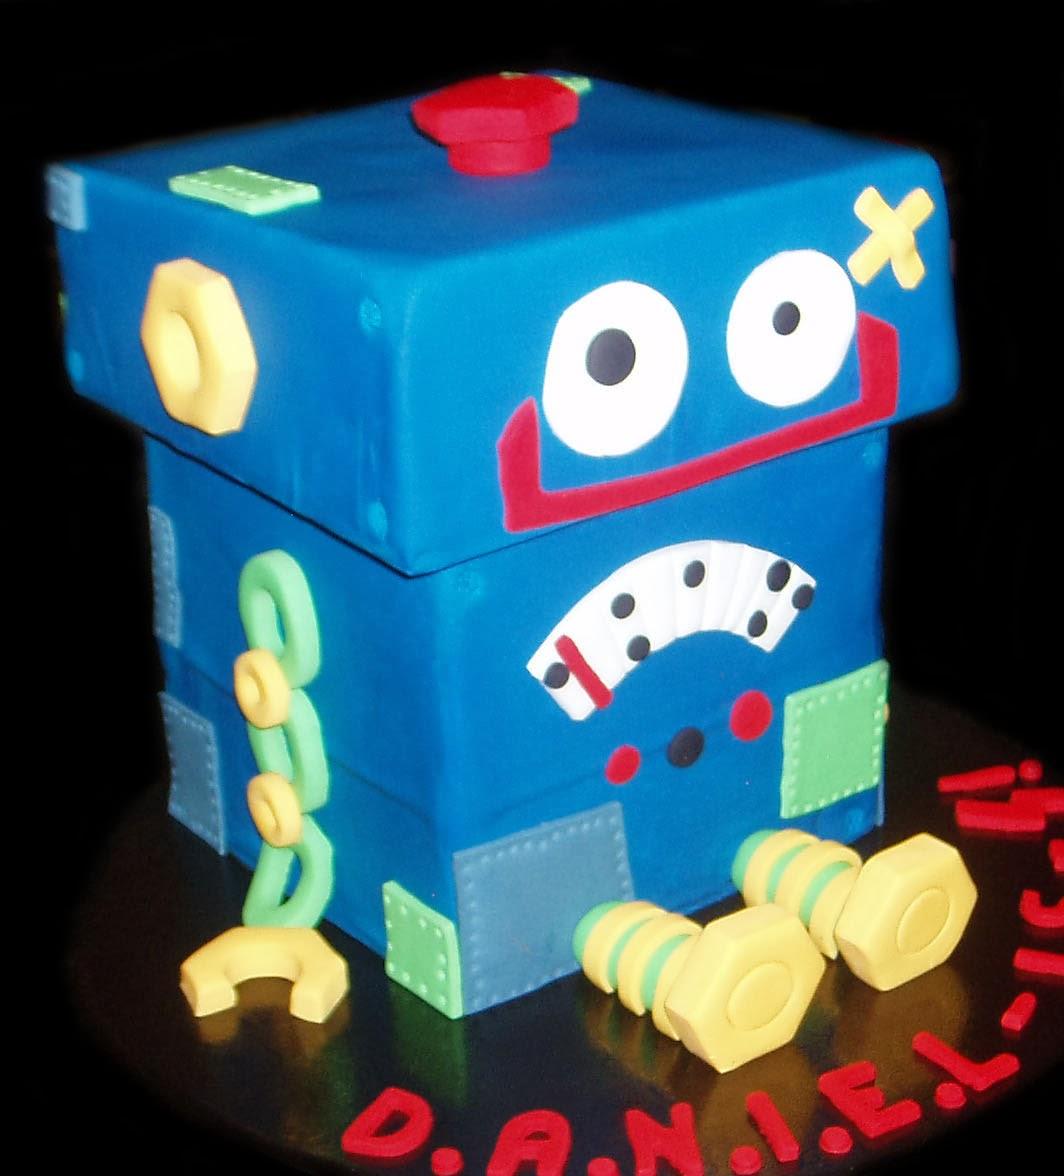 Nadas Cakes 3d Robot Birthday Cake By Nadas Cakes Canberra